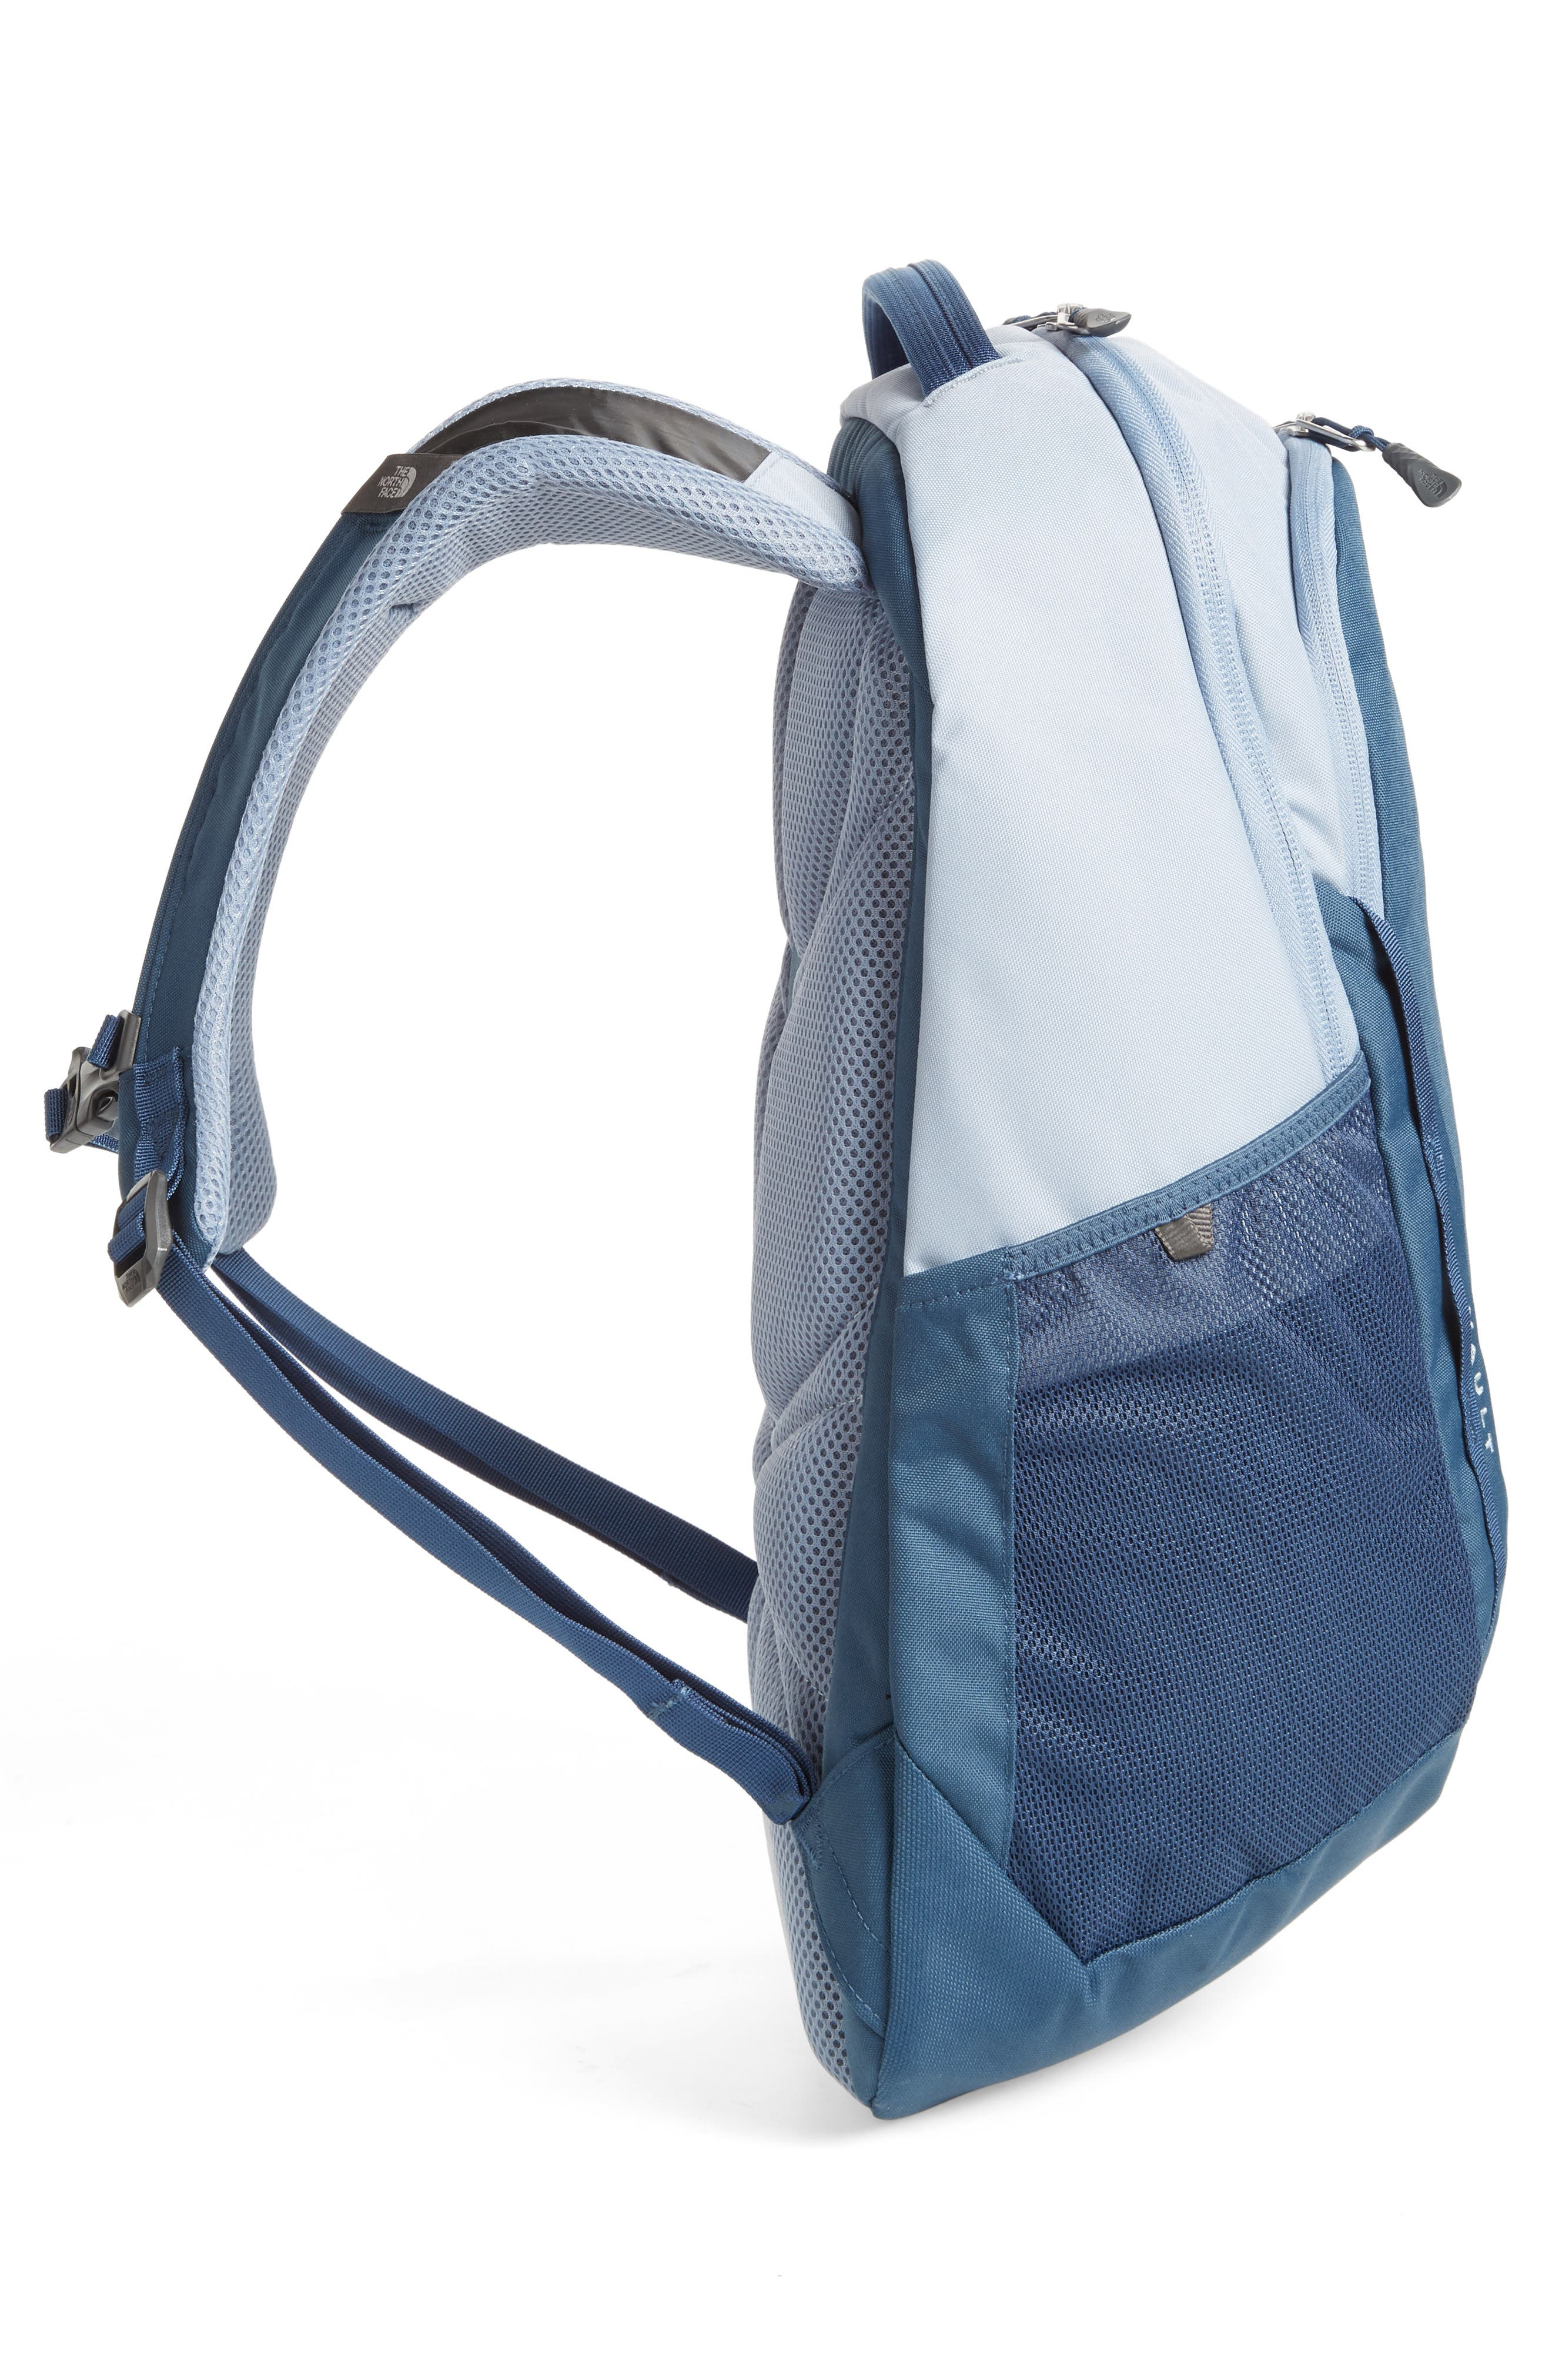 Vault Backpack,                             Alternate thumbnail 4, color,                             420